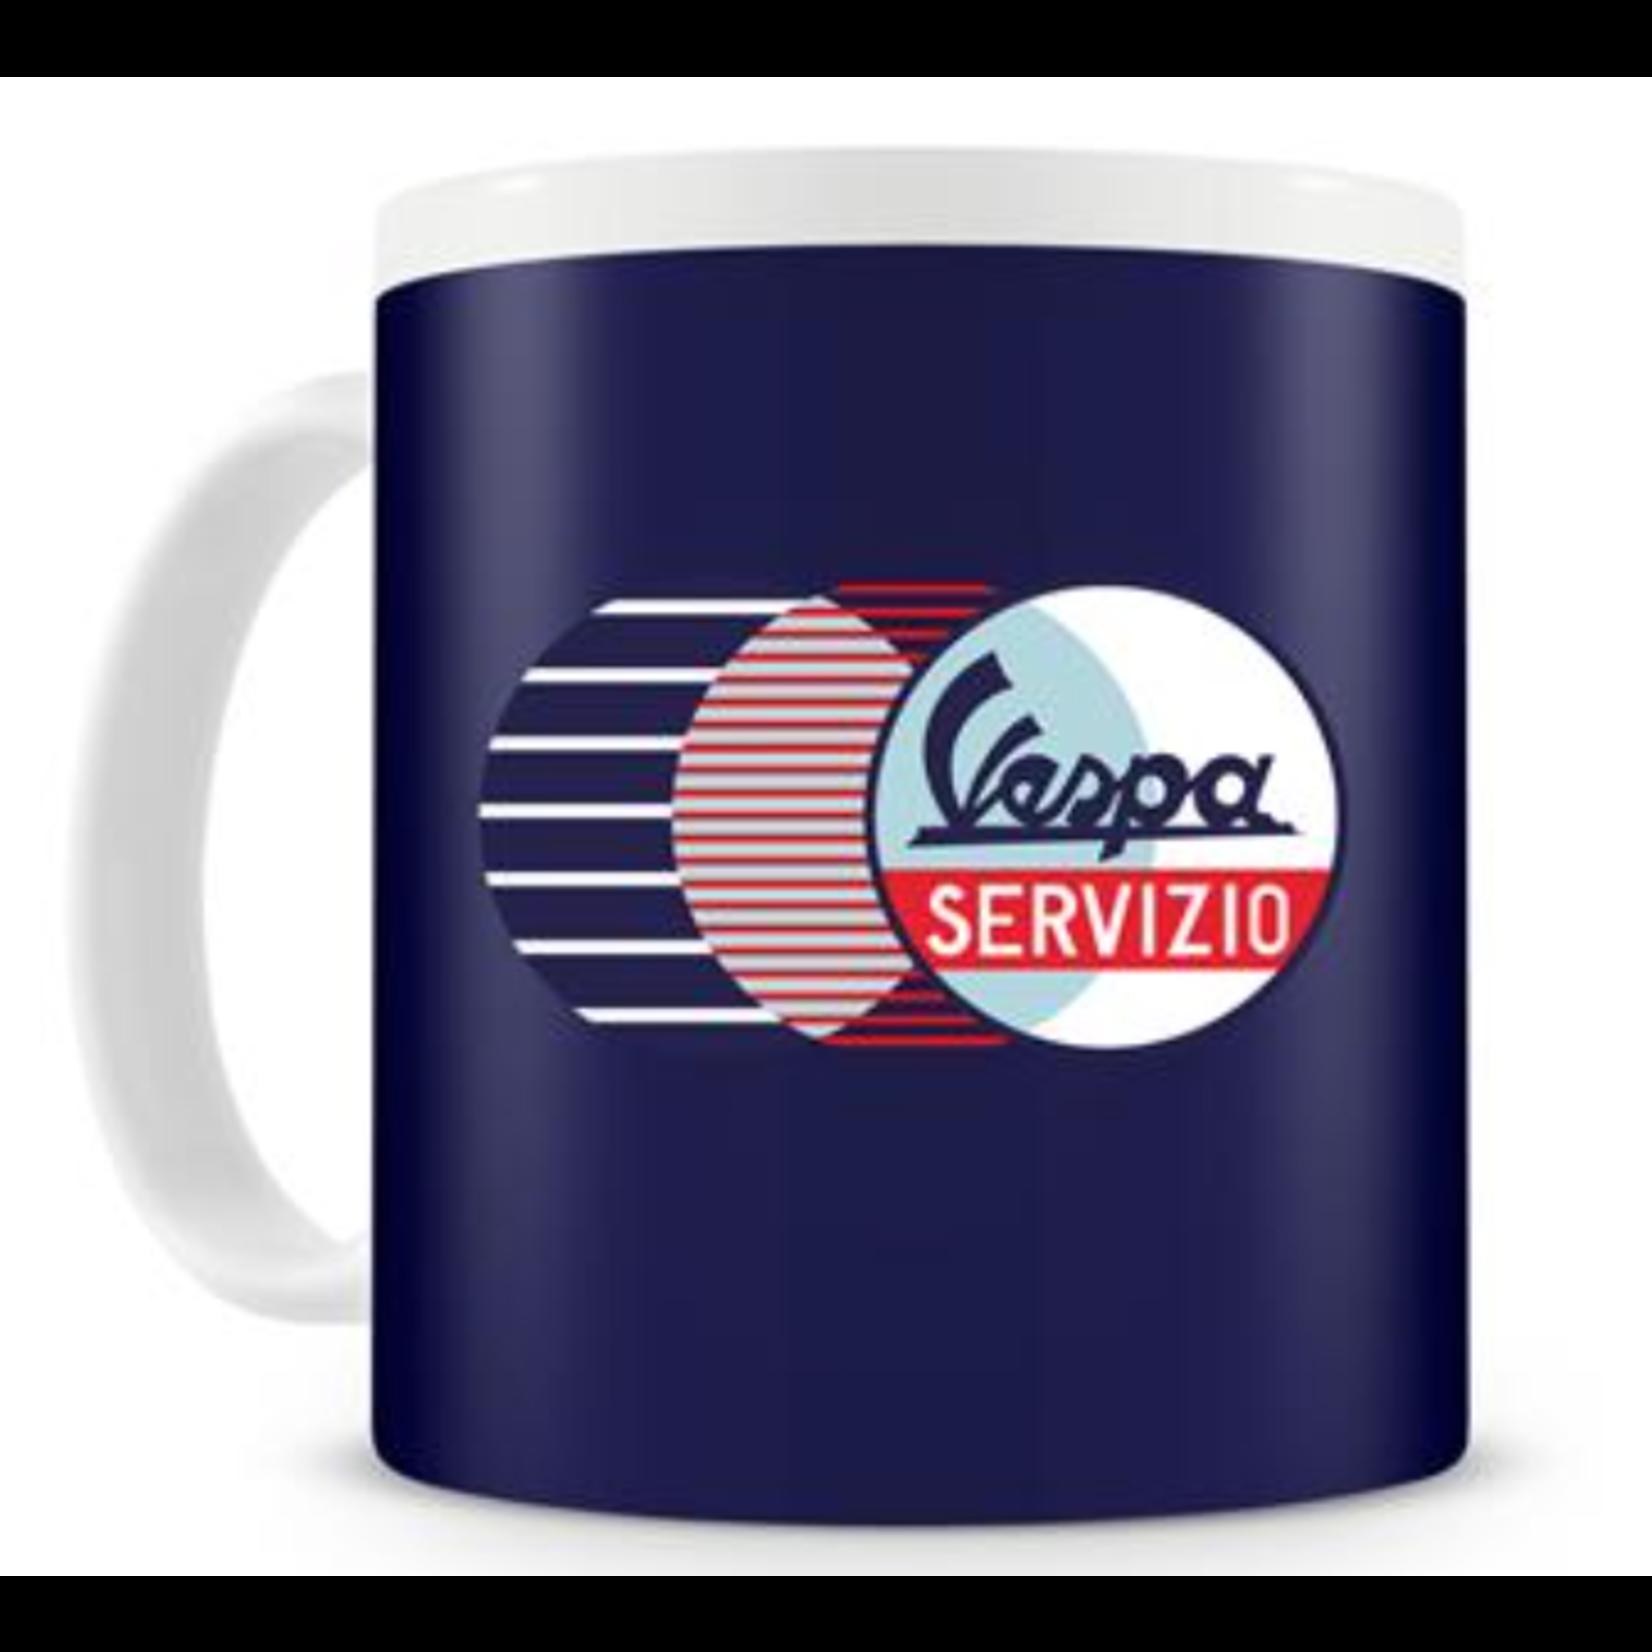 "Lifestyle Mug, ""Vespa Servizio"" Blue Ceramic"